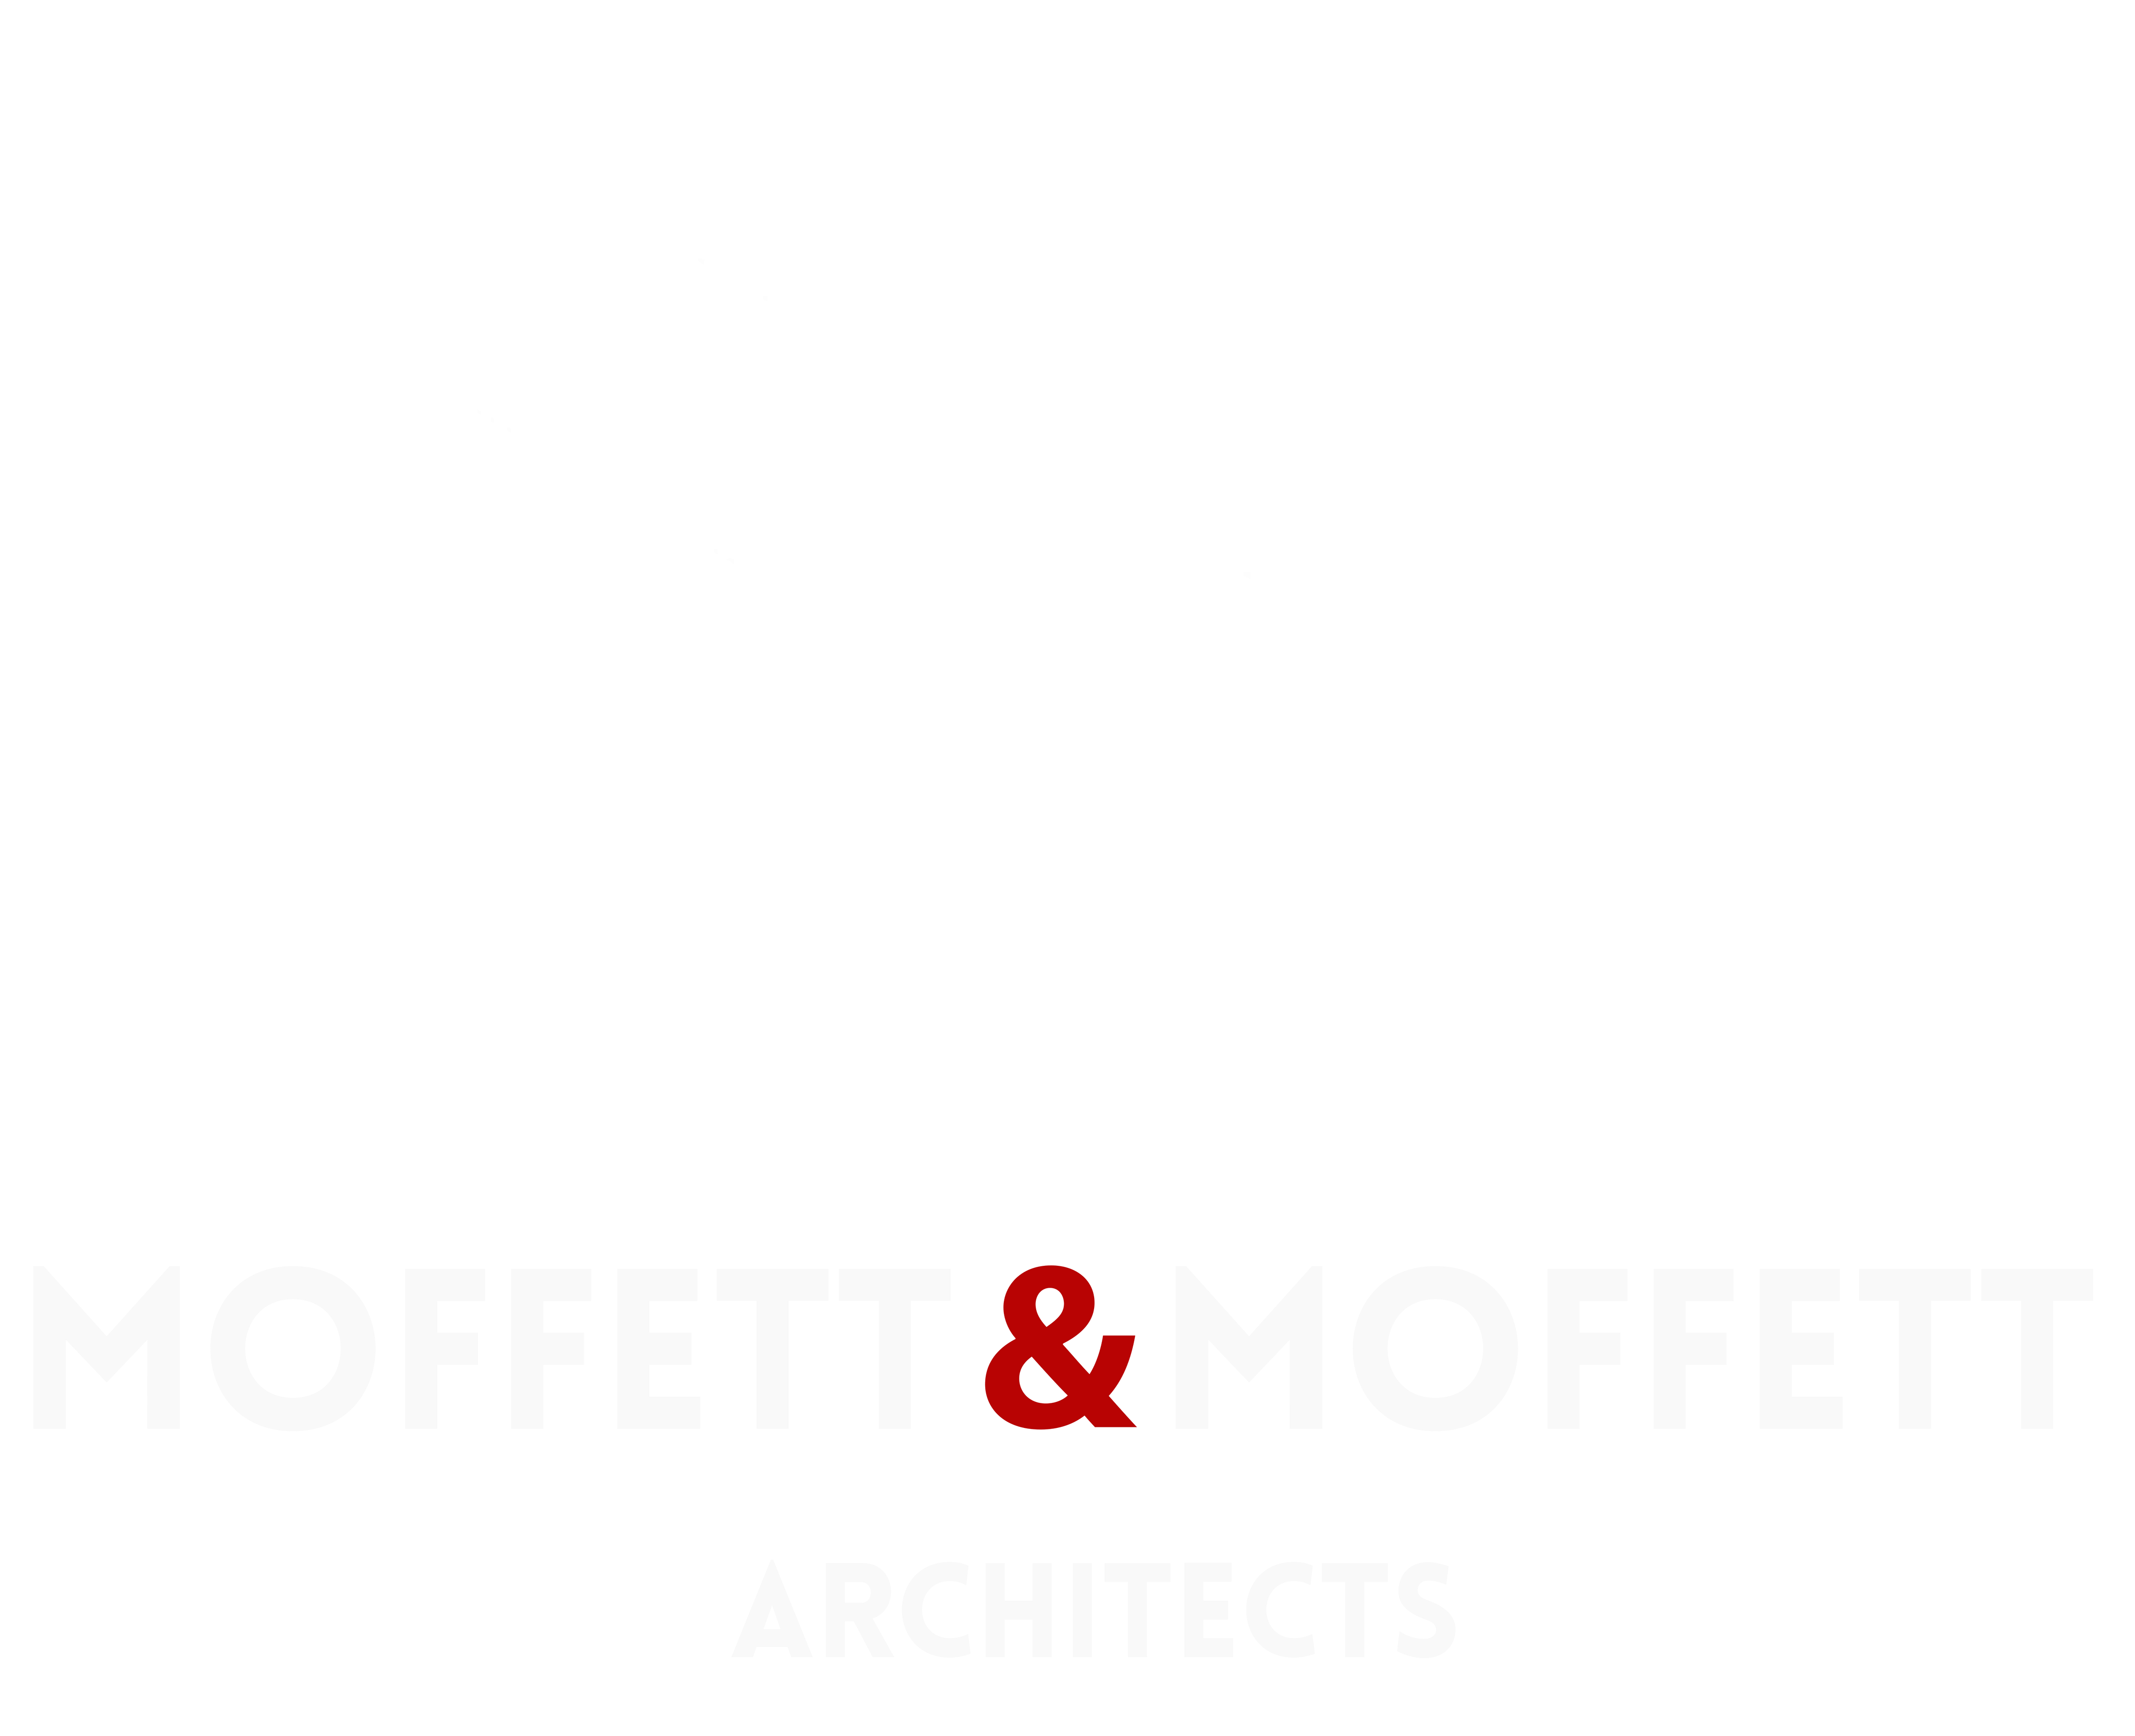 Moffett & Moffett Architects